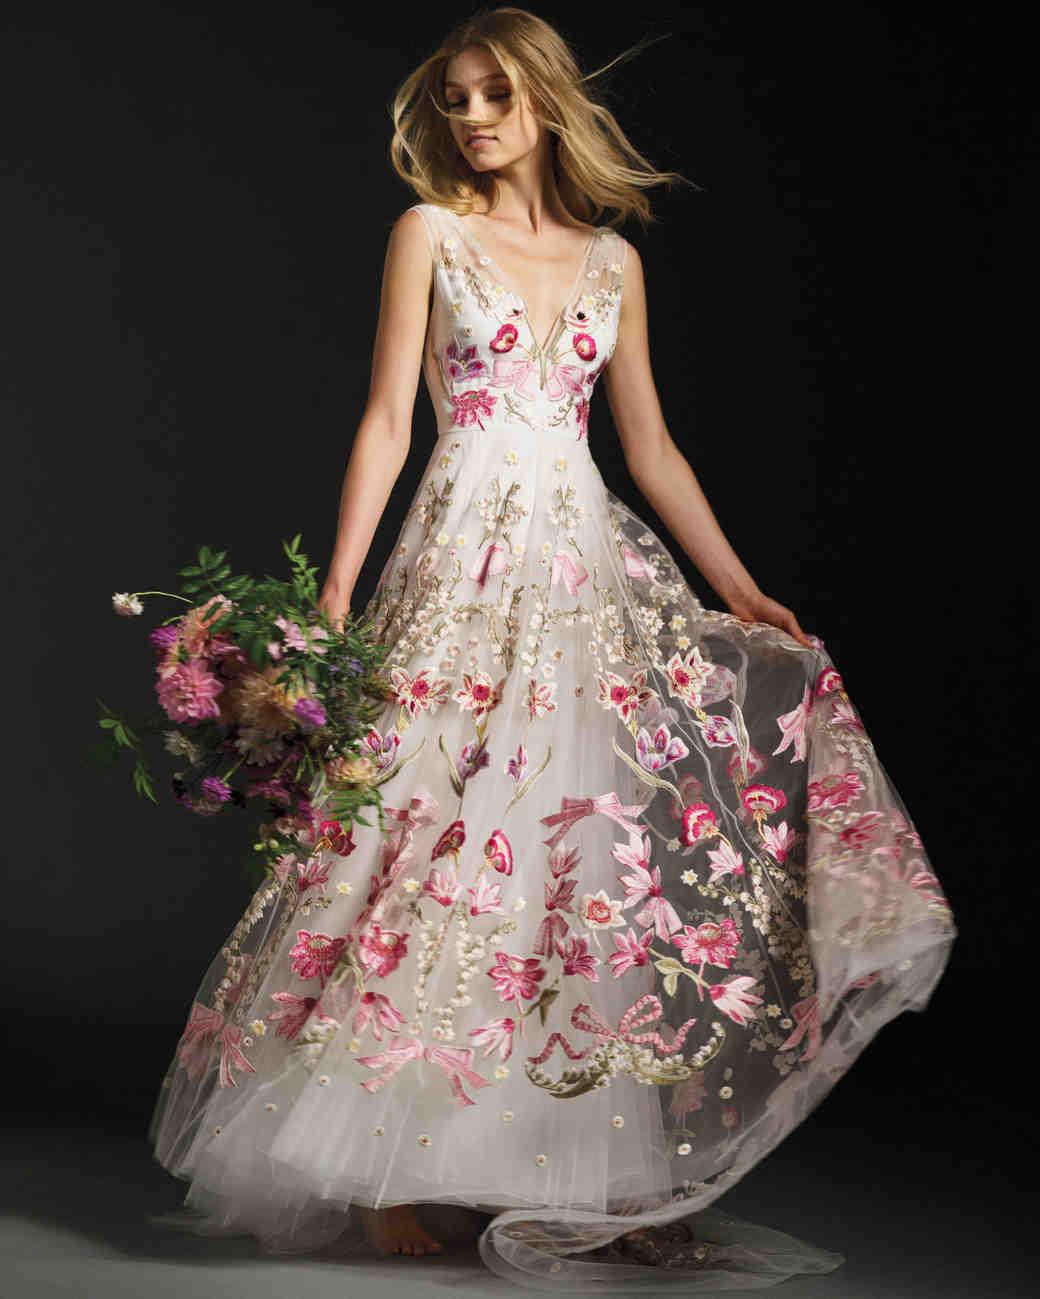 colored wedding dresses colored wedding dress Colorful Wedding Dresses That Make a Statement Down the Aisle Martha Stewart Weddings